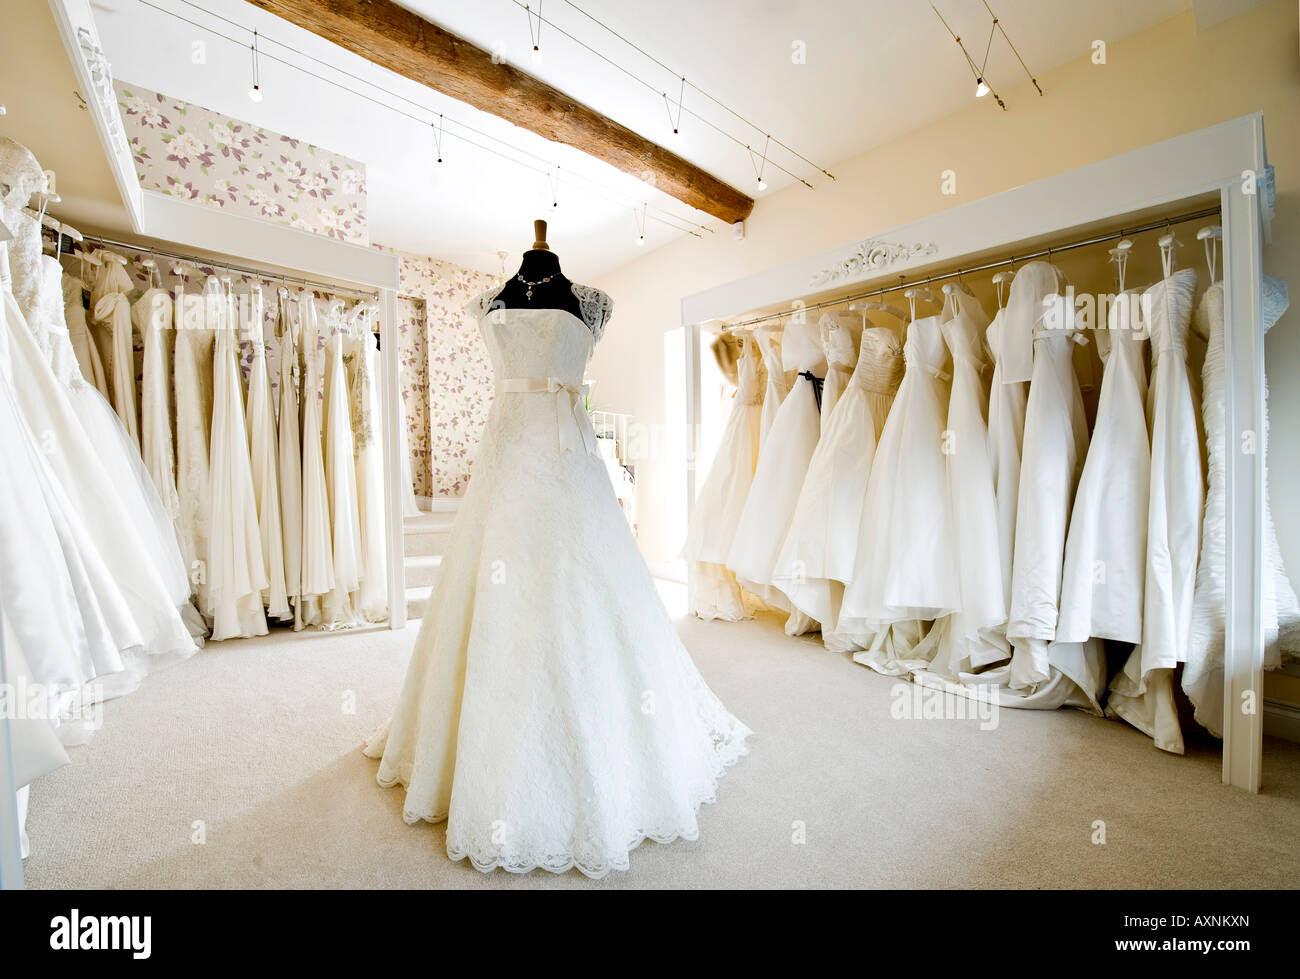 Amazing Bridesmaid Dresses London Shops Adornment - Wedding Dress ...